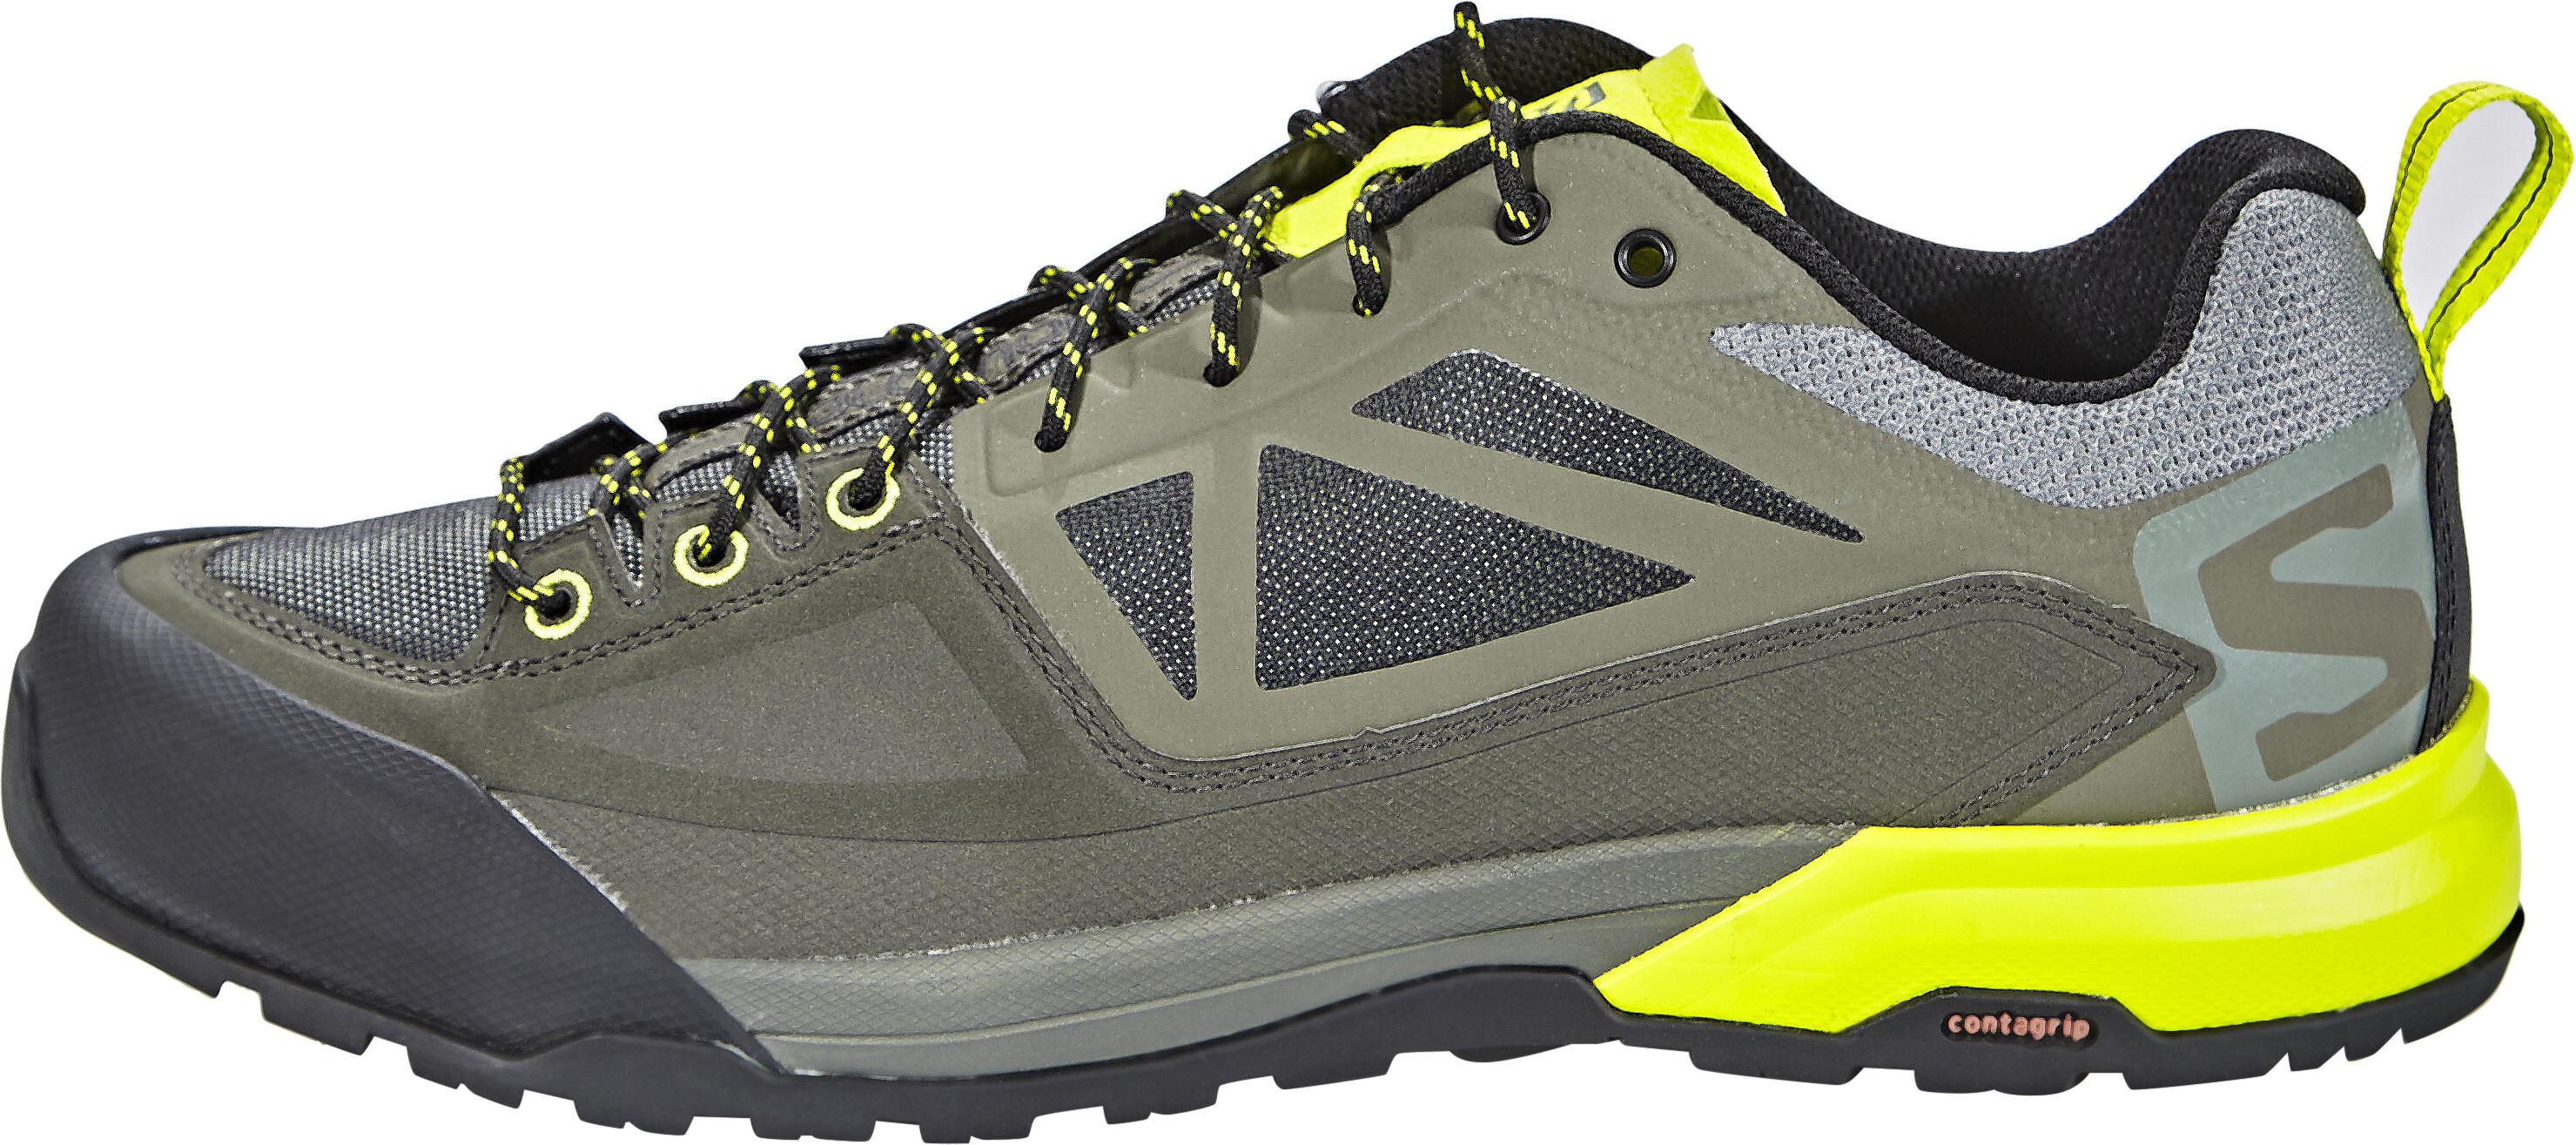 Salomon X Alp Spry Shoes Men grey olive at Addnature.co.uk 1281e3fb1d6